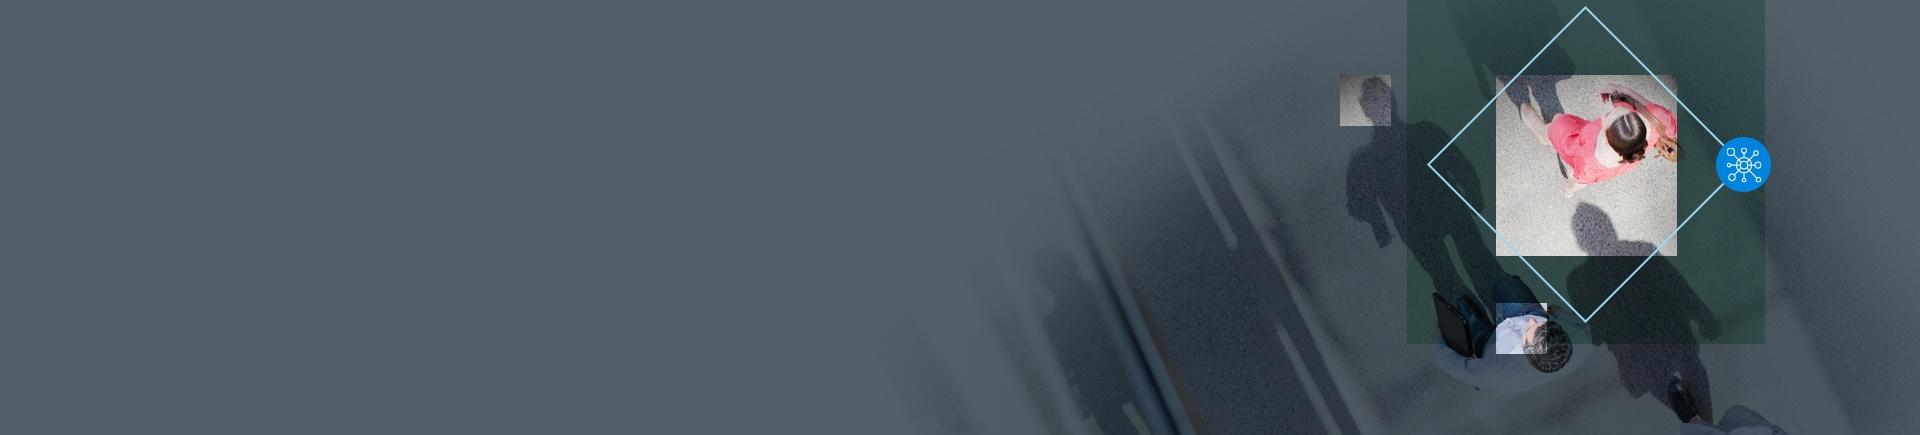 Sitefinity Webinar Omnichannel Delivery